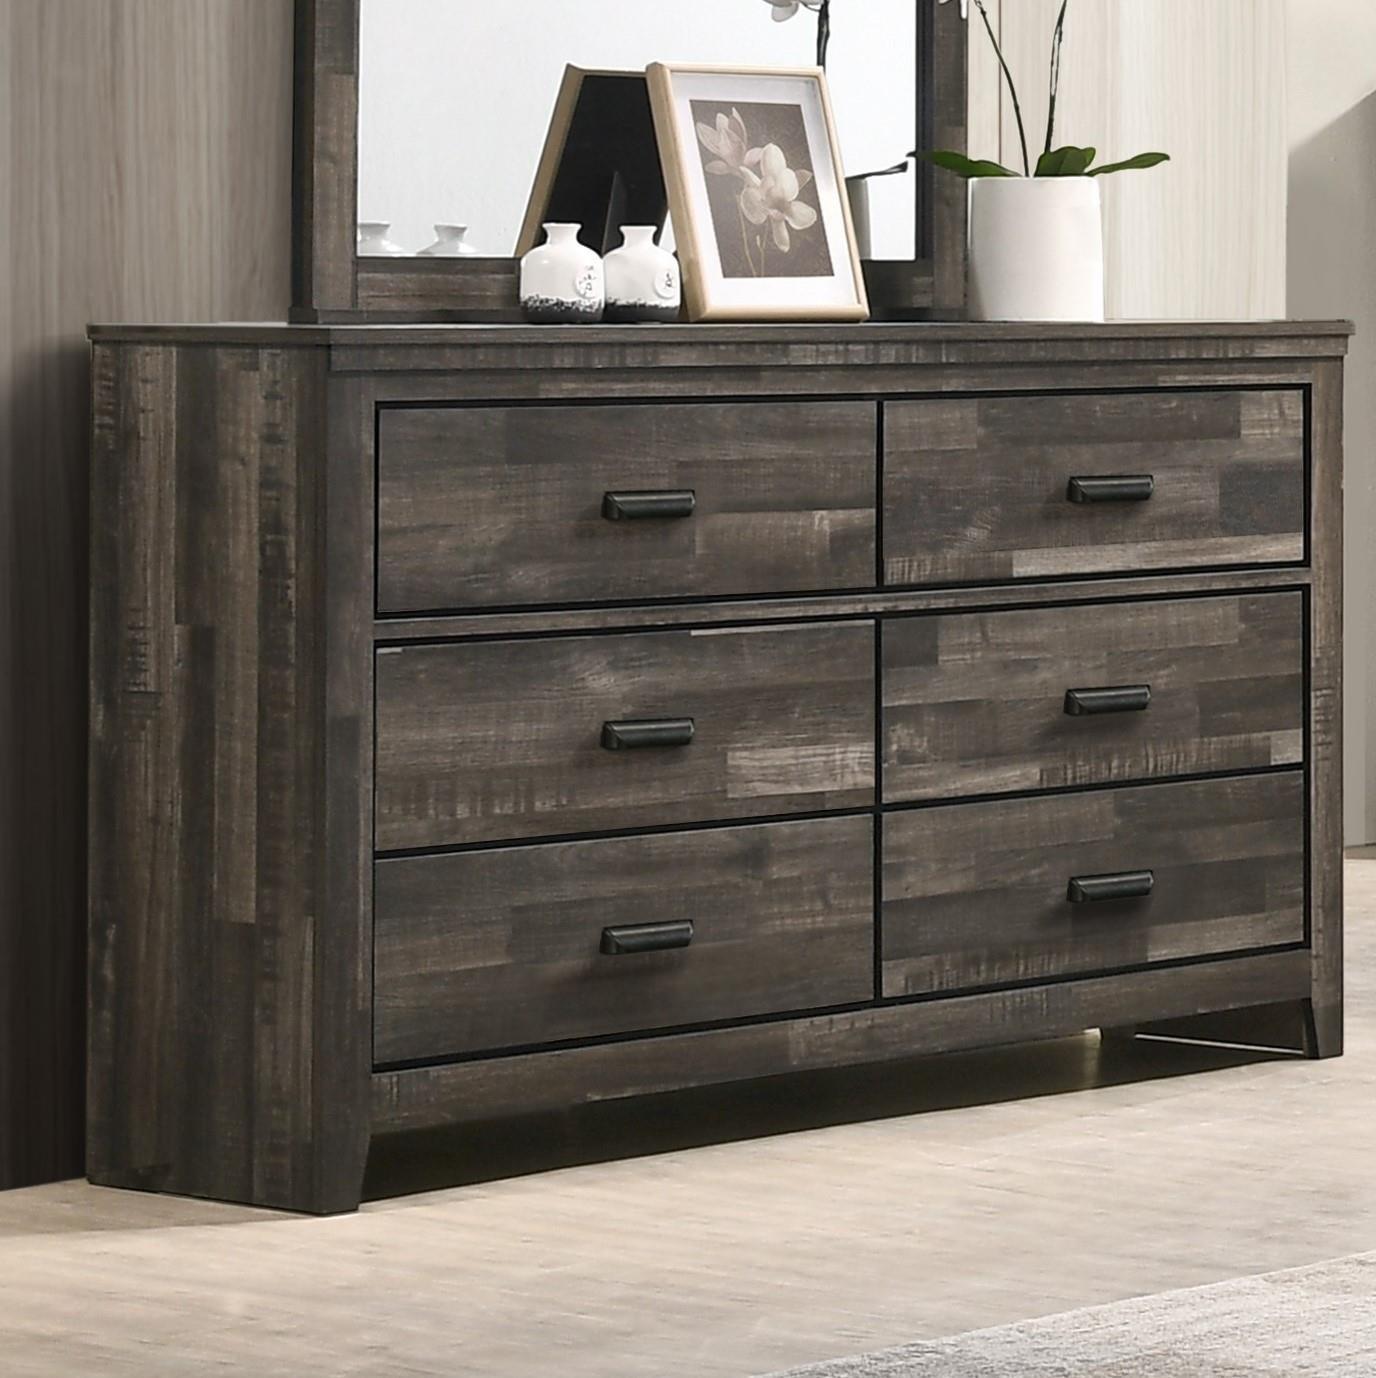 B6800 CARTER Double Dresser by Crown Mark at Furniture Fair - North Carolina